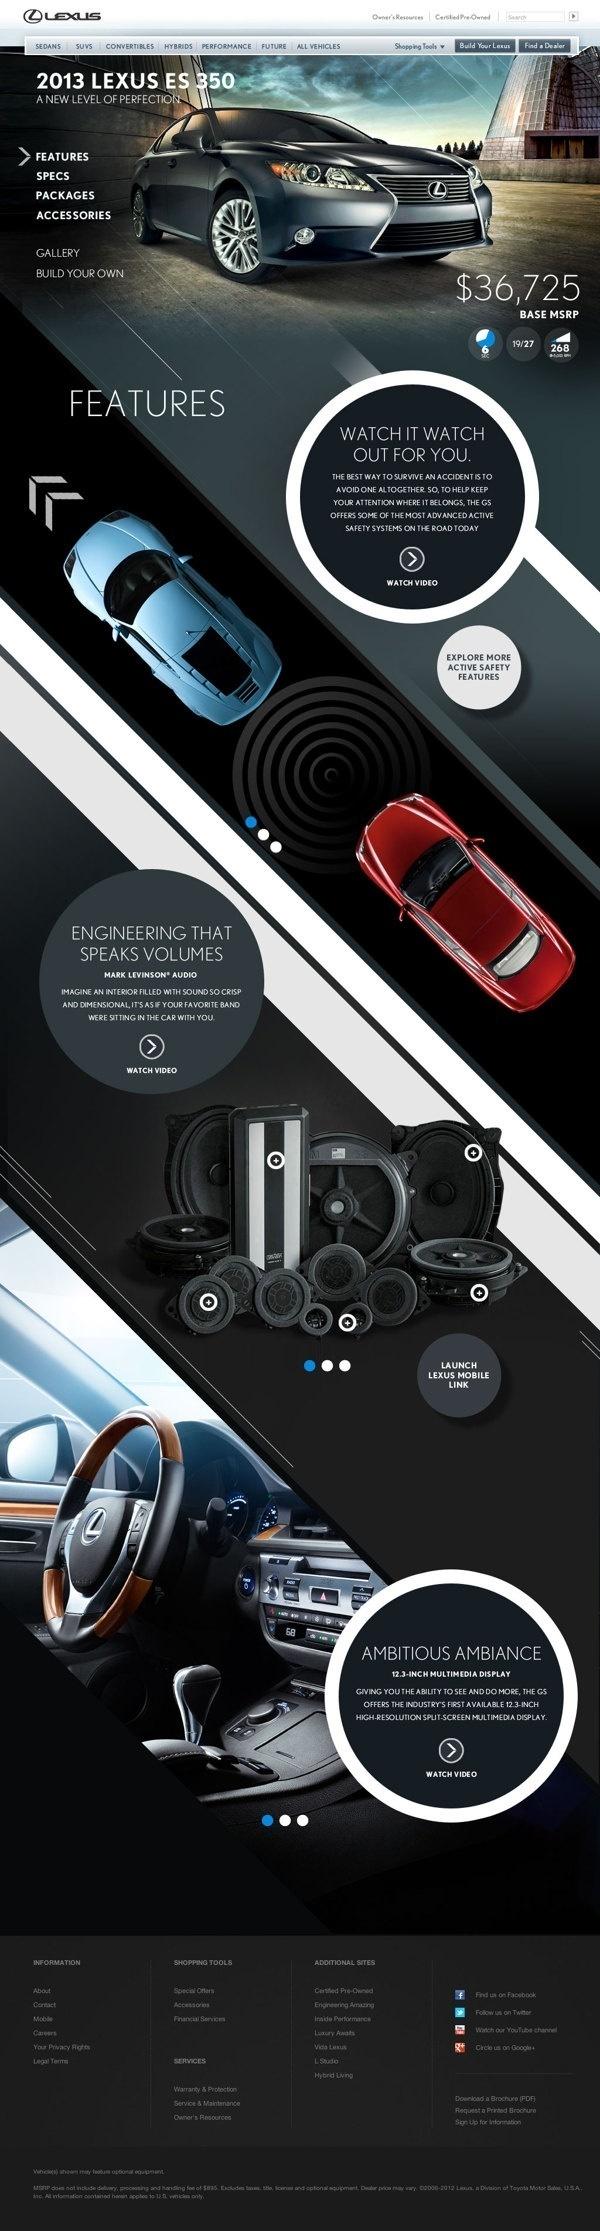 Lexus HTML5 Parallax by bil Chamberlin #interactive #ux #design #& #ui #digital